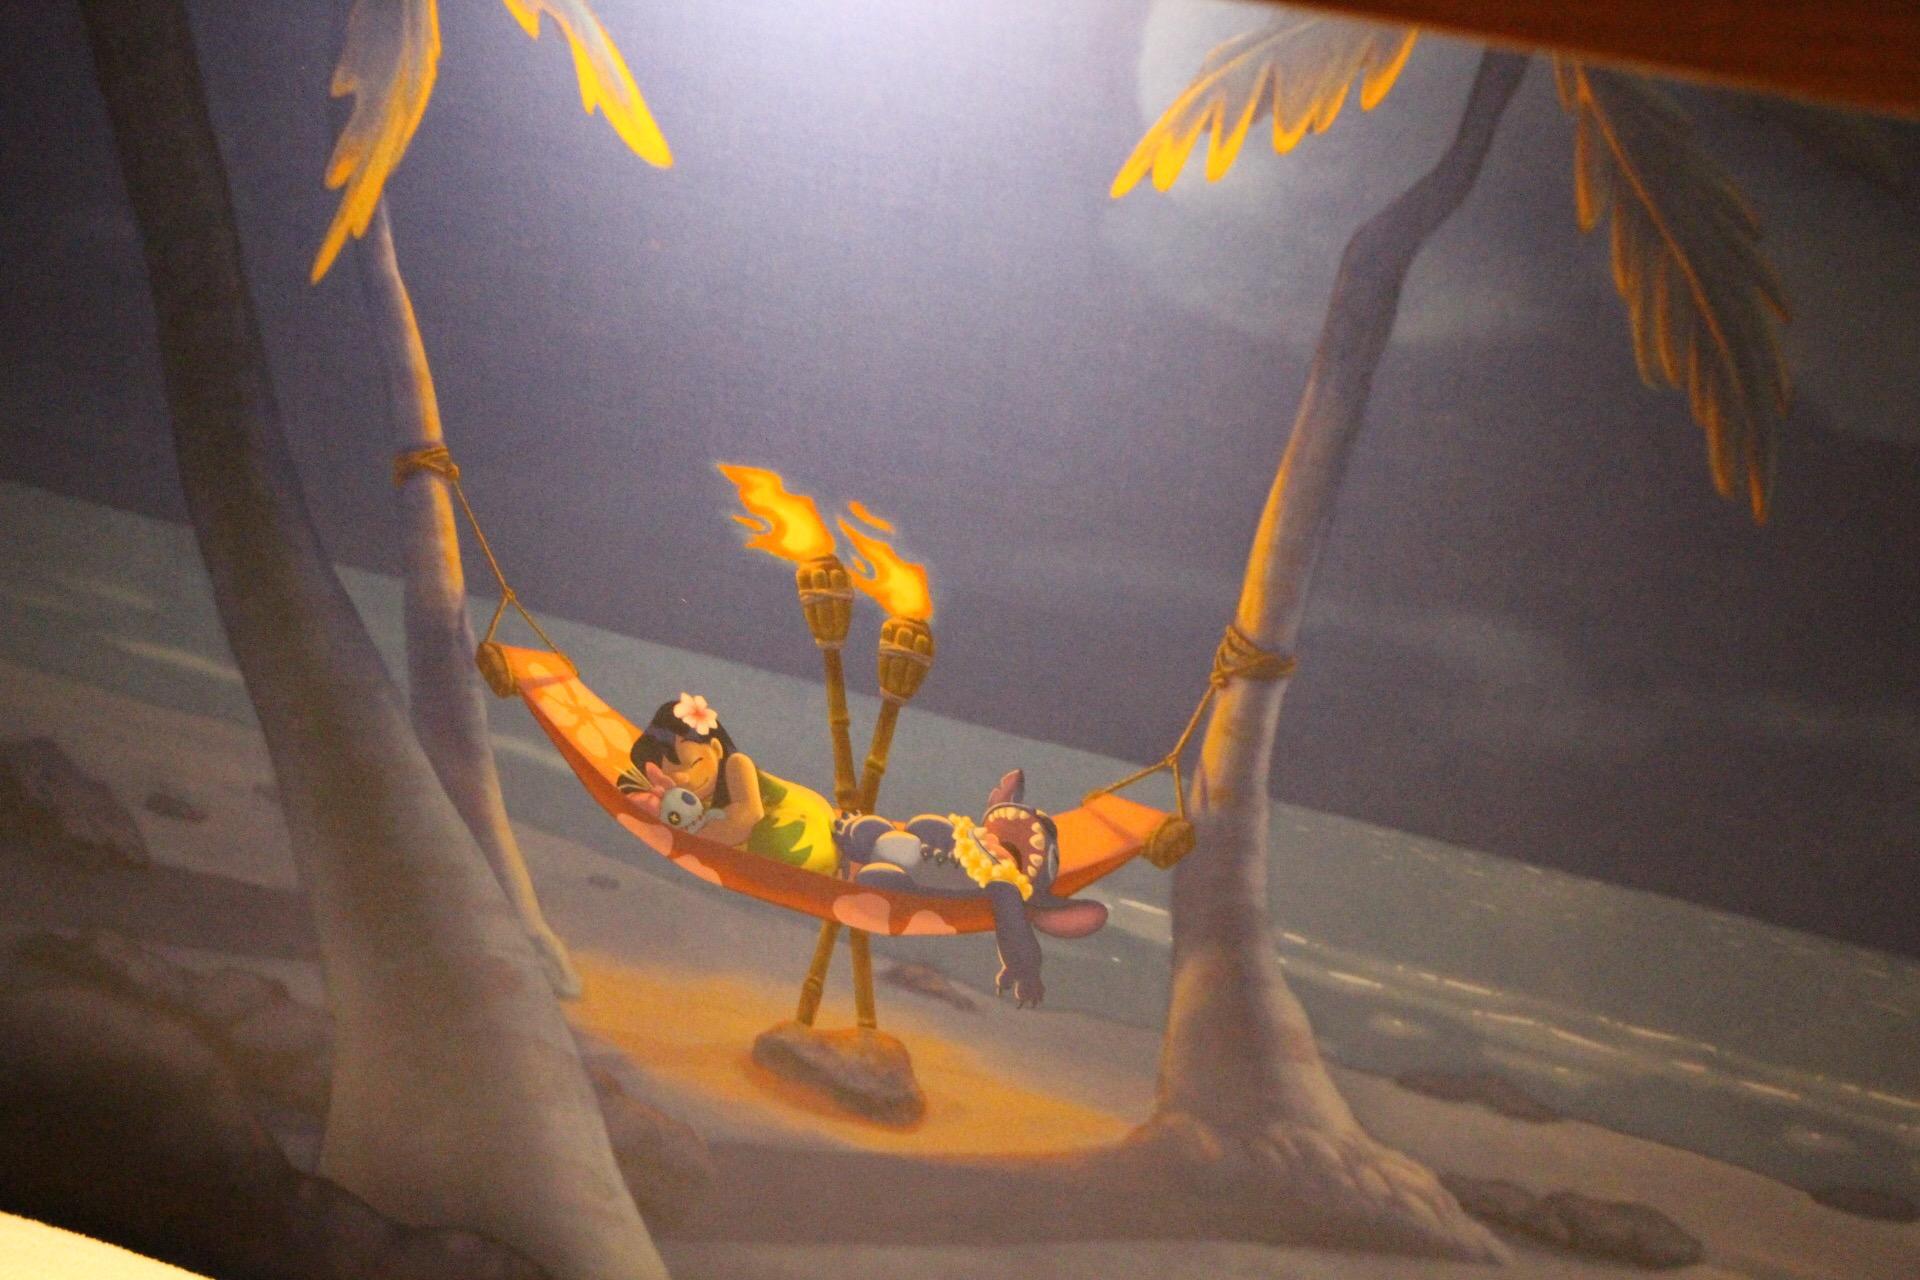 Disney's Polynesian Village Resort Bungalow Lilo & Stitch